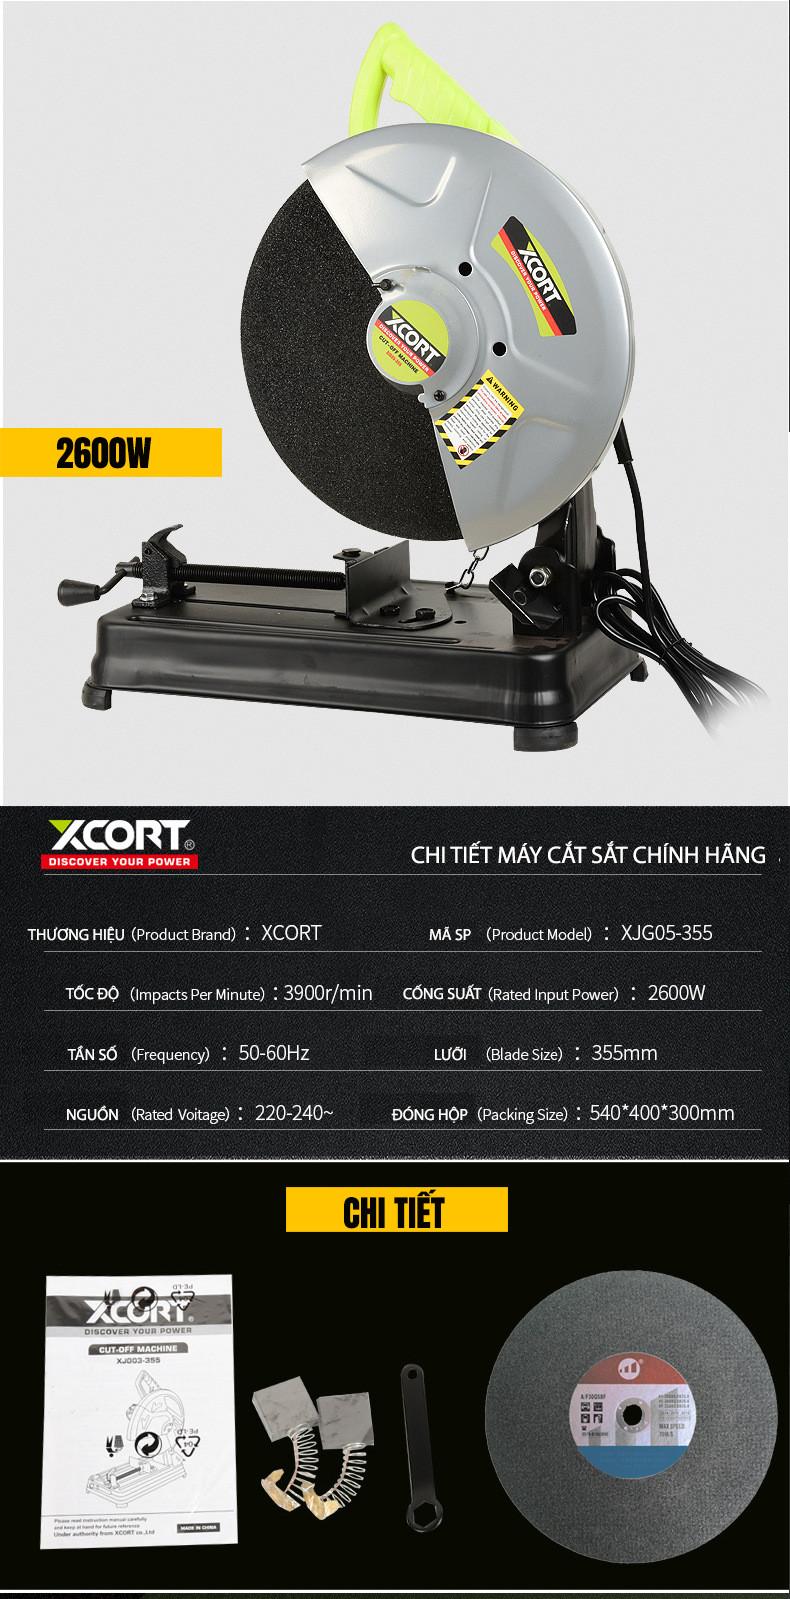 Máy cắt sắt,Máy cắt sắt 2600W XCORT